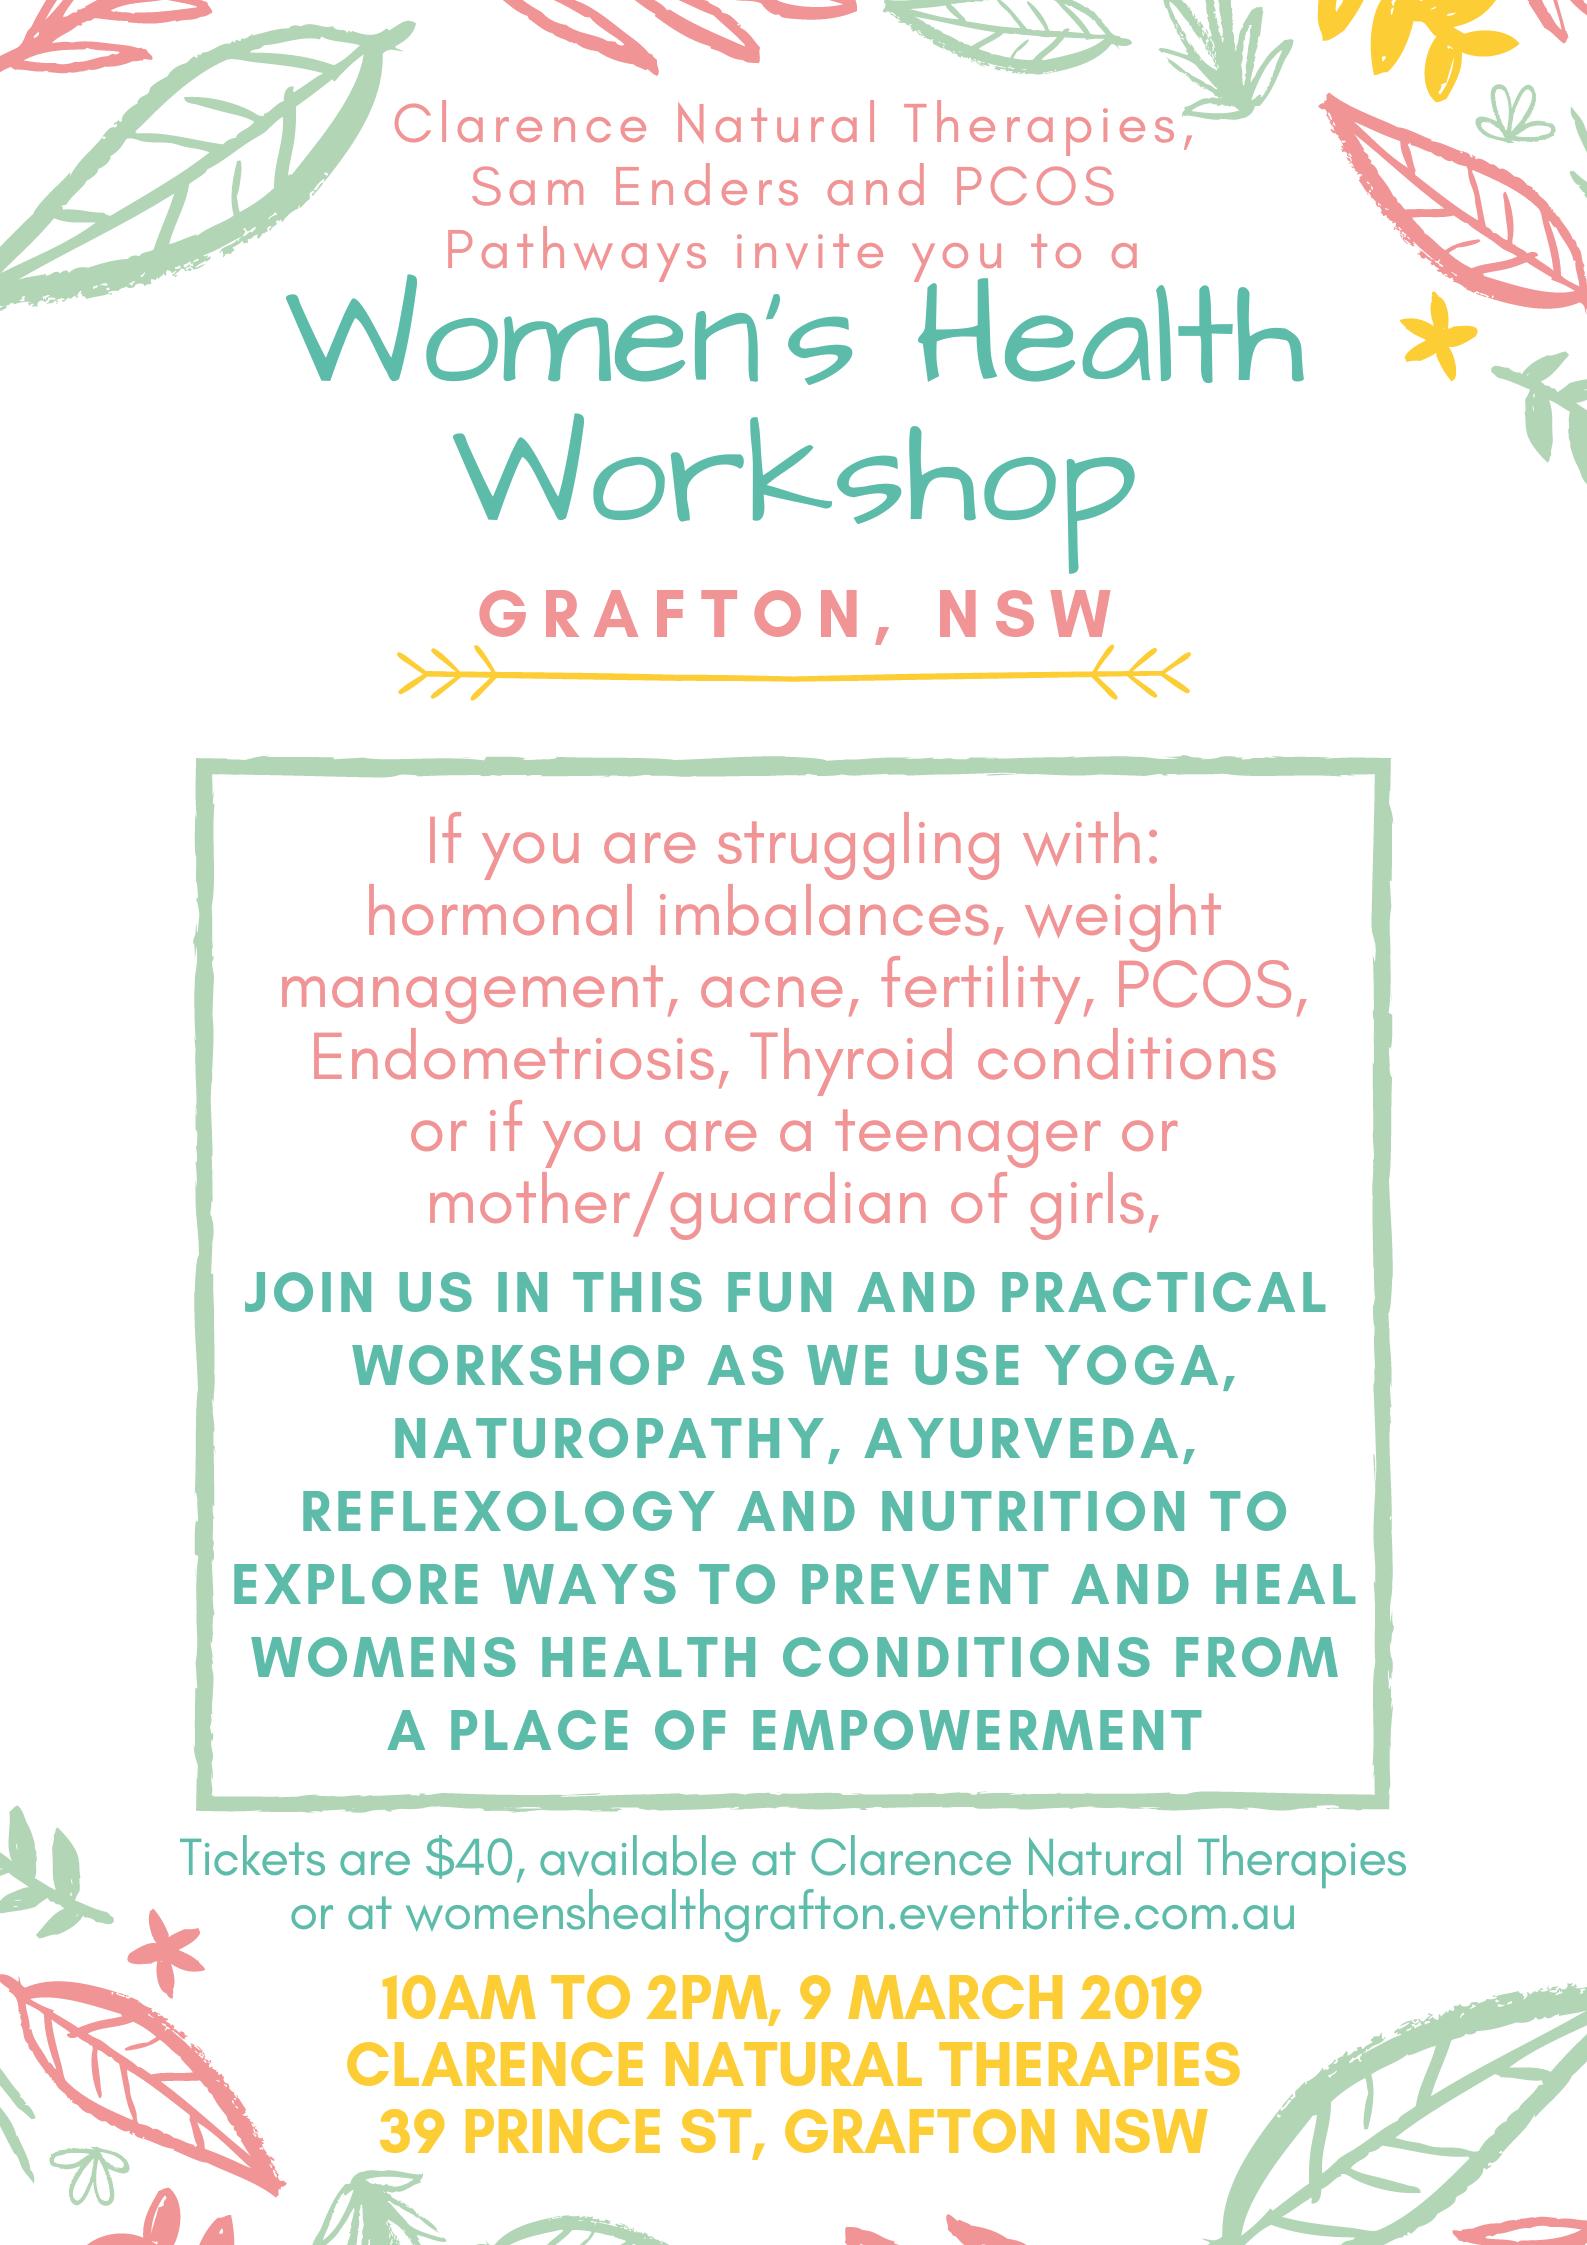 Women's Health Workshop, Grafton NSW